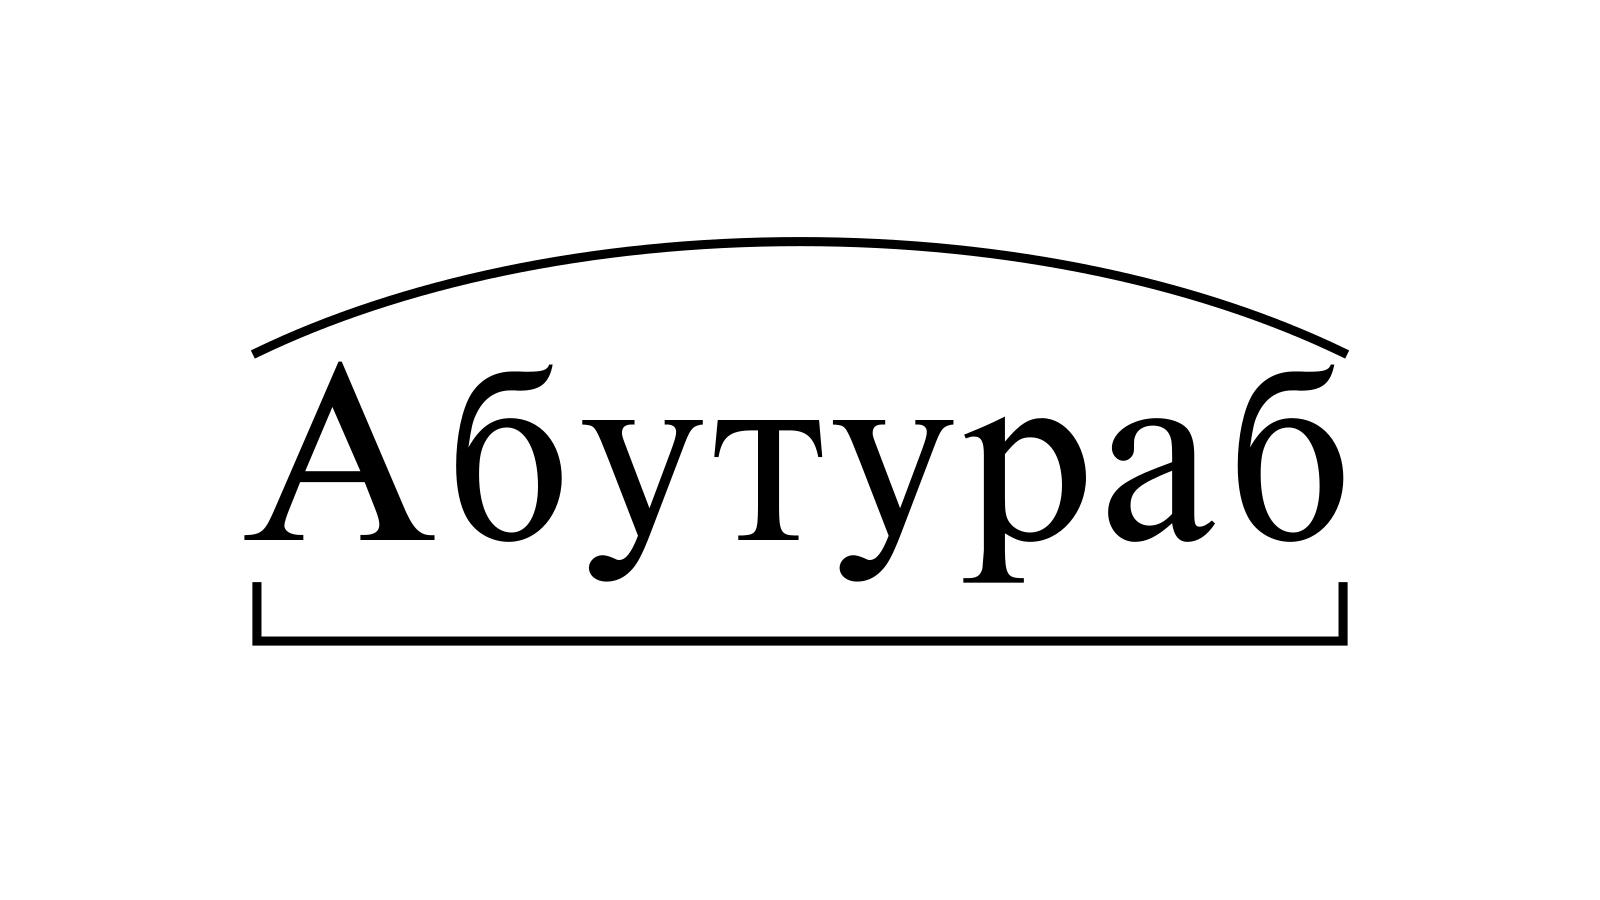 Разбор слова «Абутураб» по составу